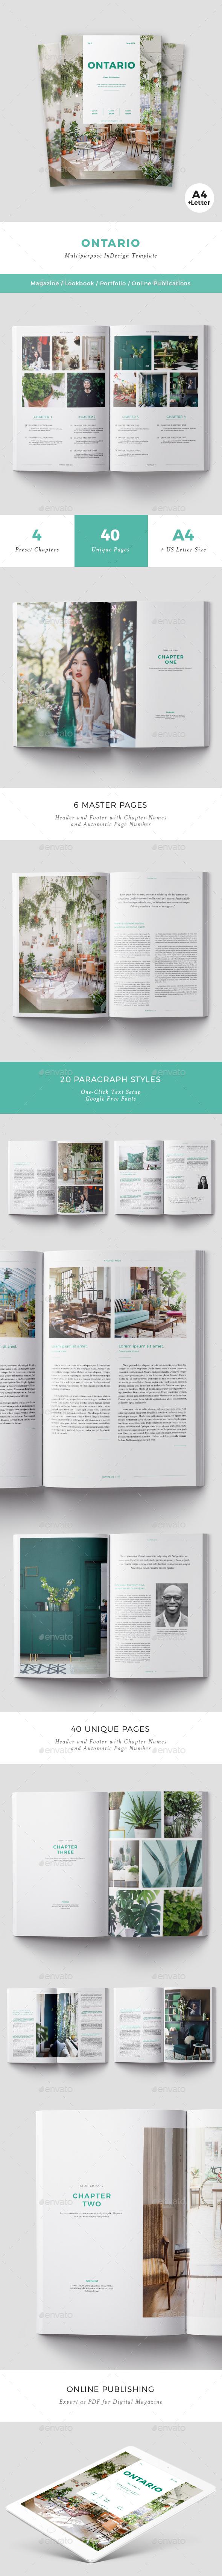 Ontario Magazine - Magazines Print Templates